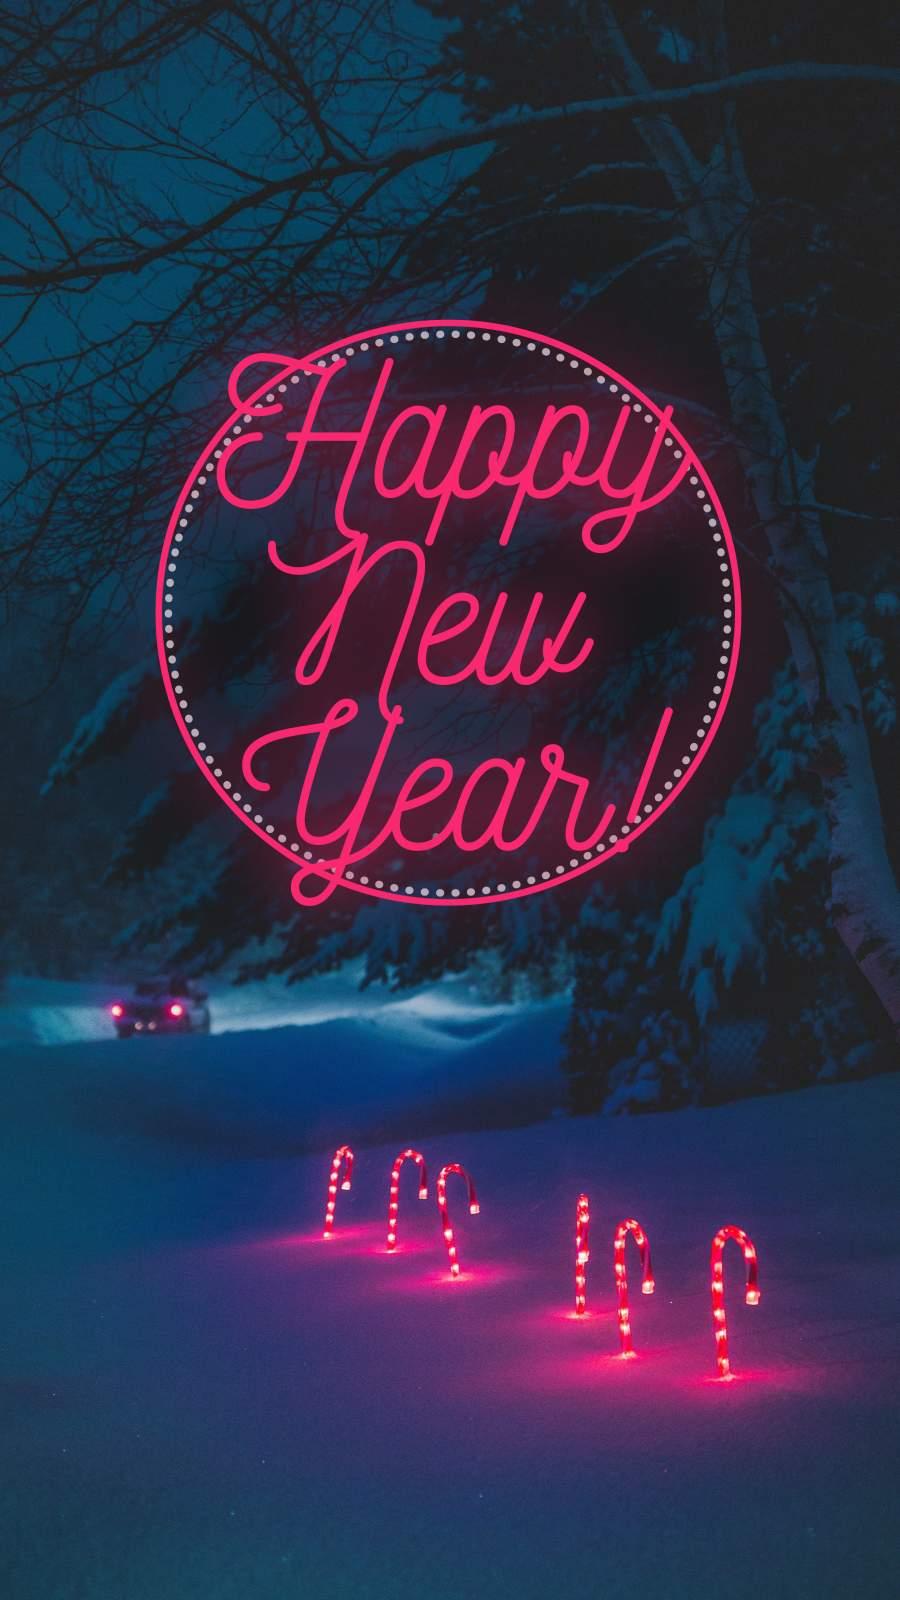 Happy New Year Winter